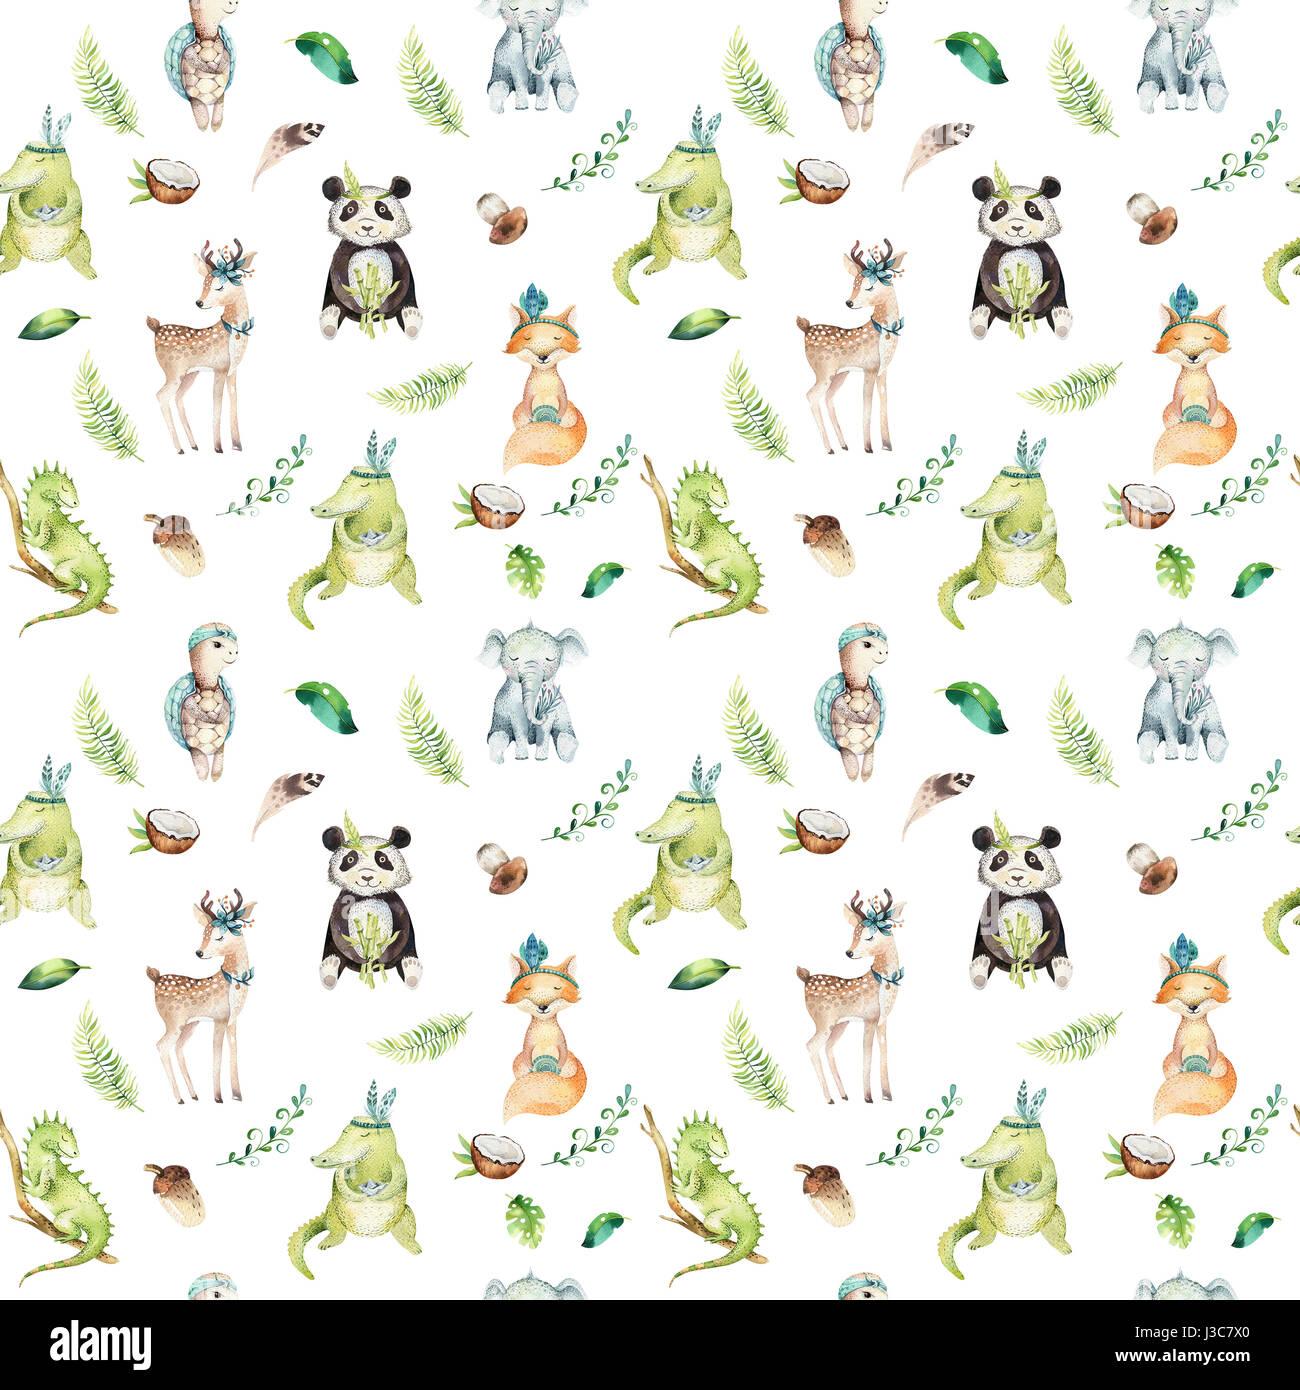 Baby Animals Nursery Isolated Seamless Pattern Watercolor Boho Stock Photo